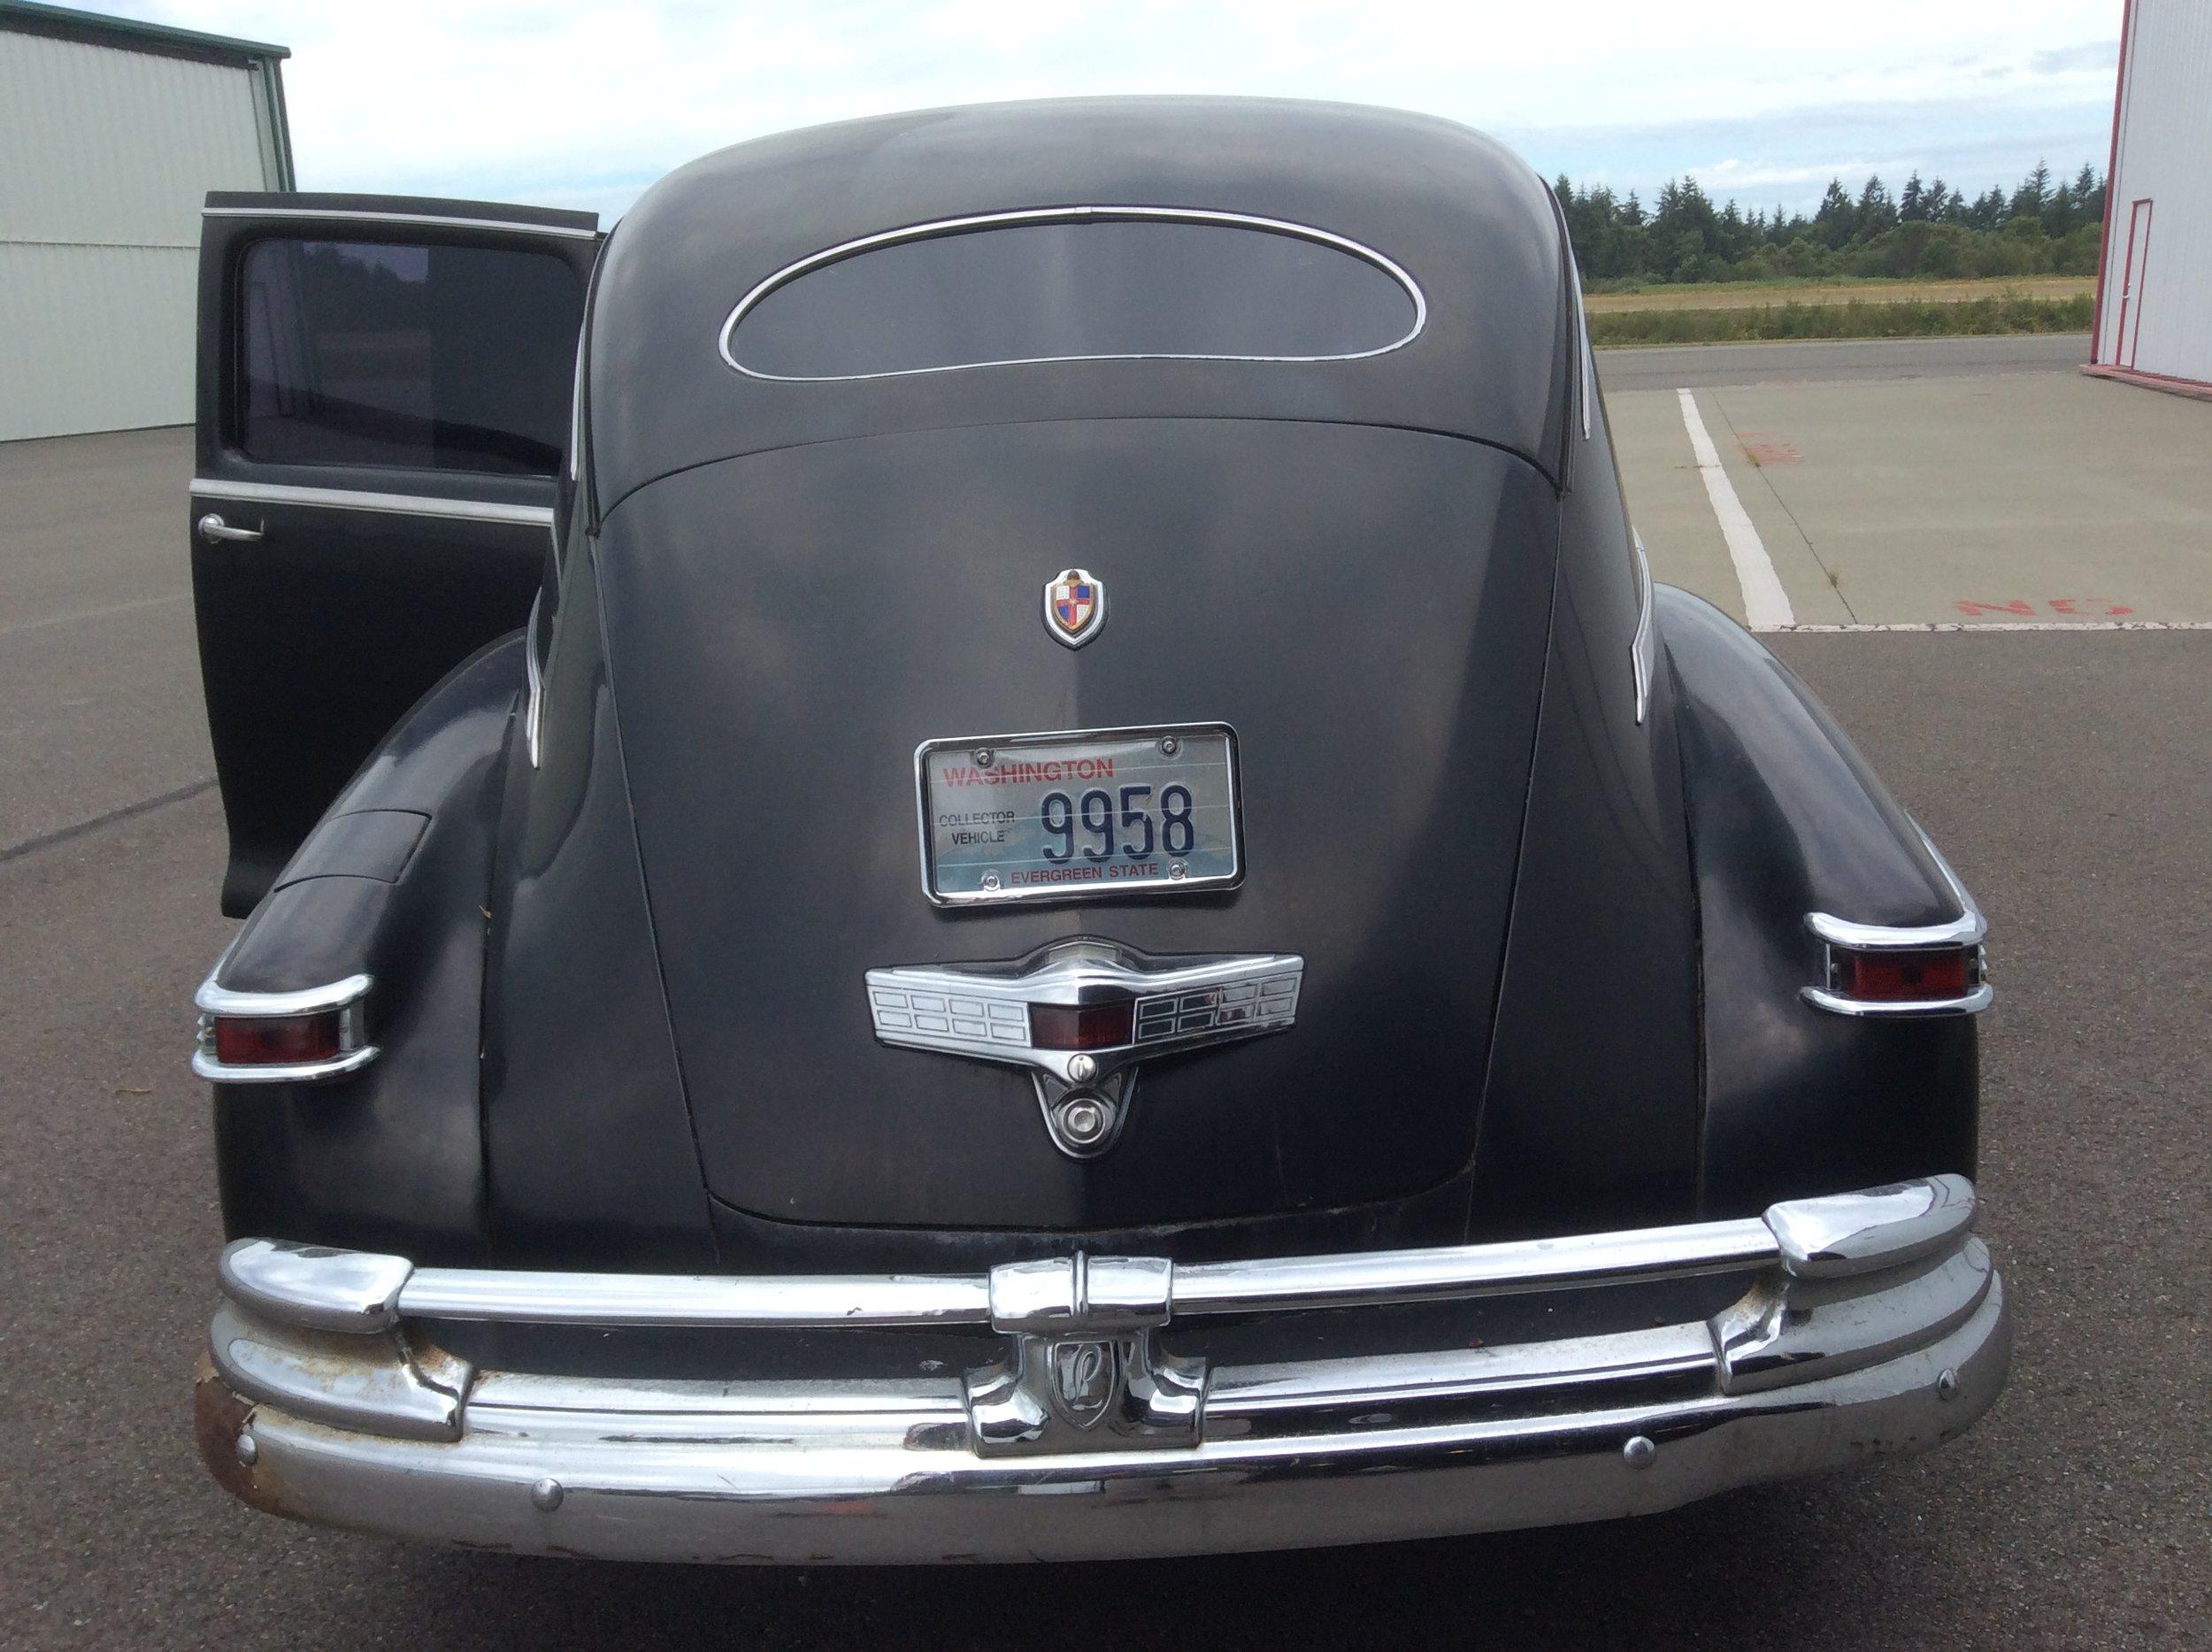 1948 Lincoln Zephyr (237).JPG